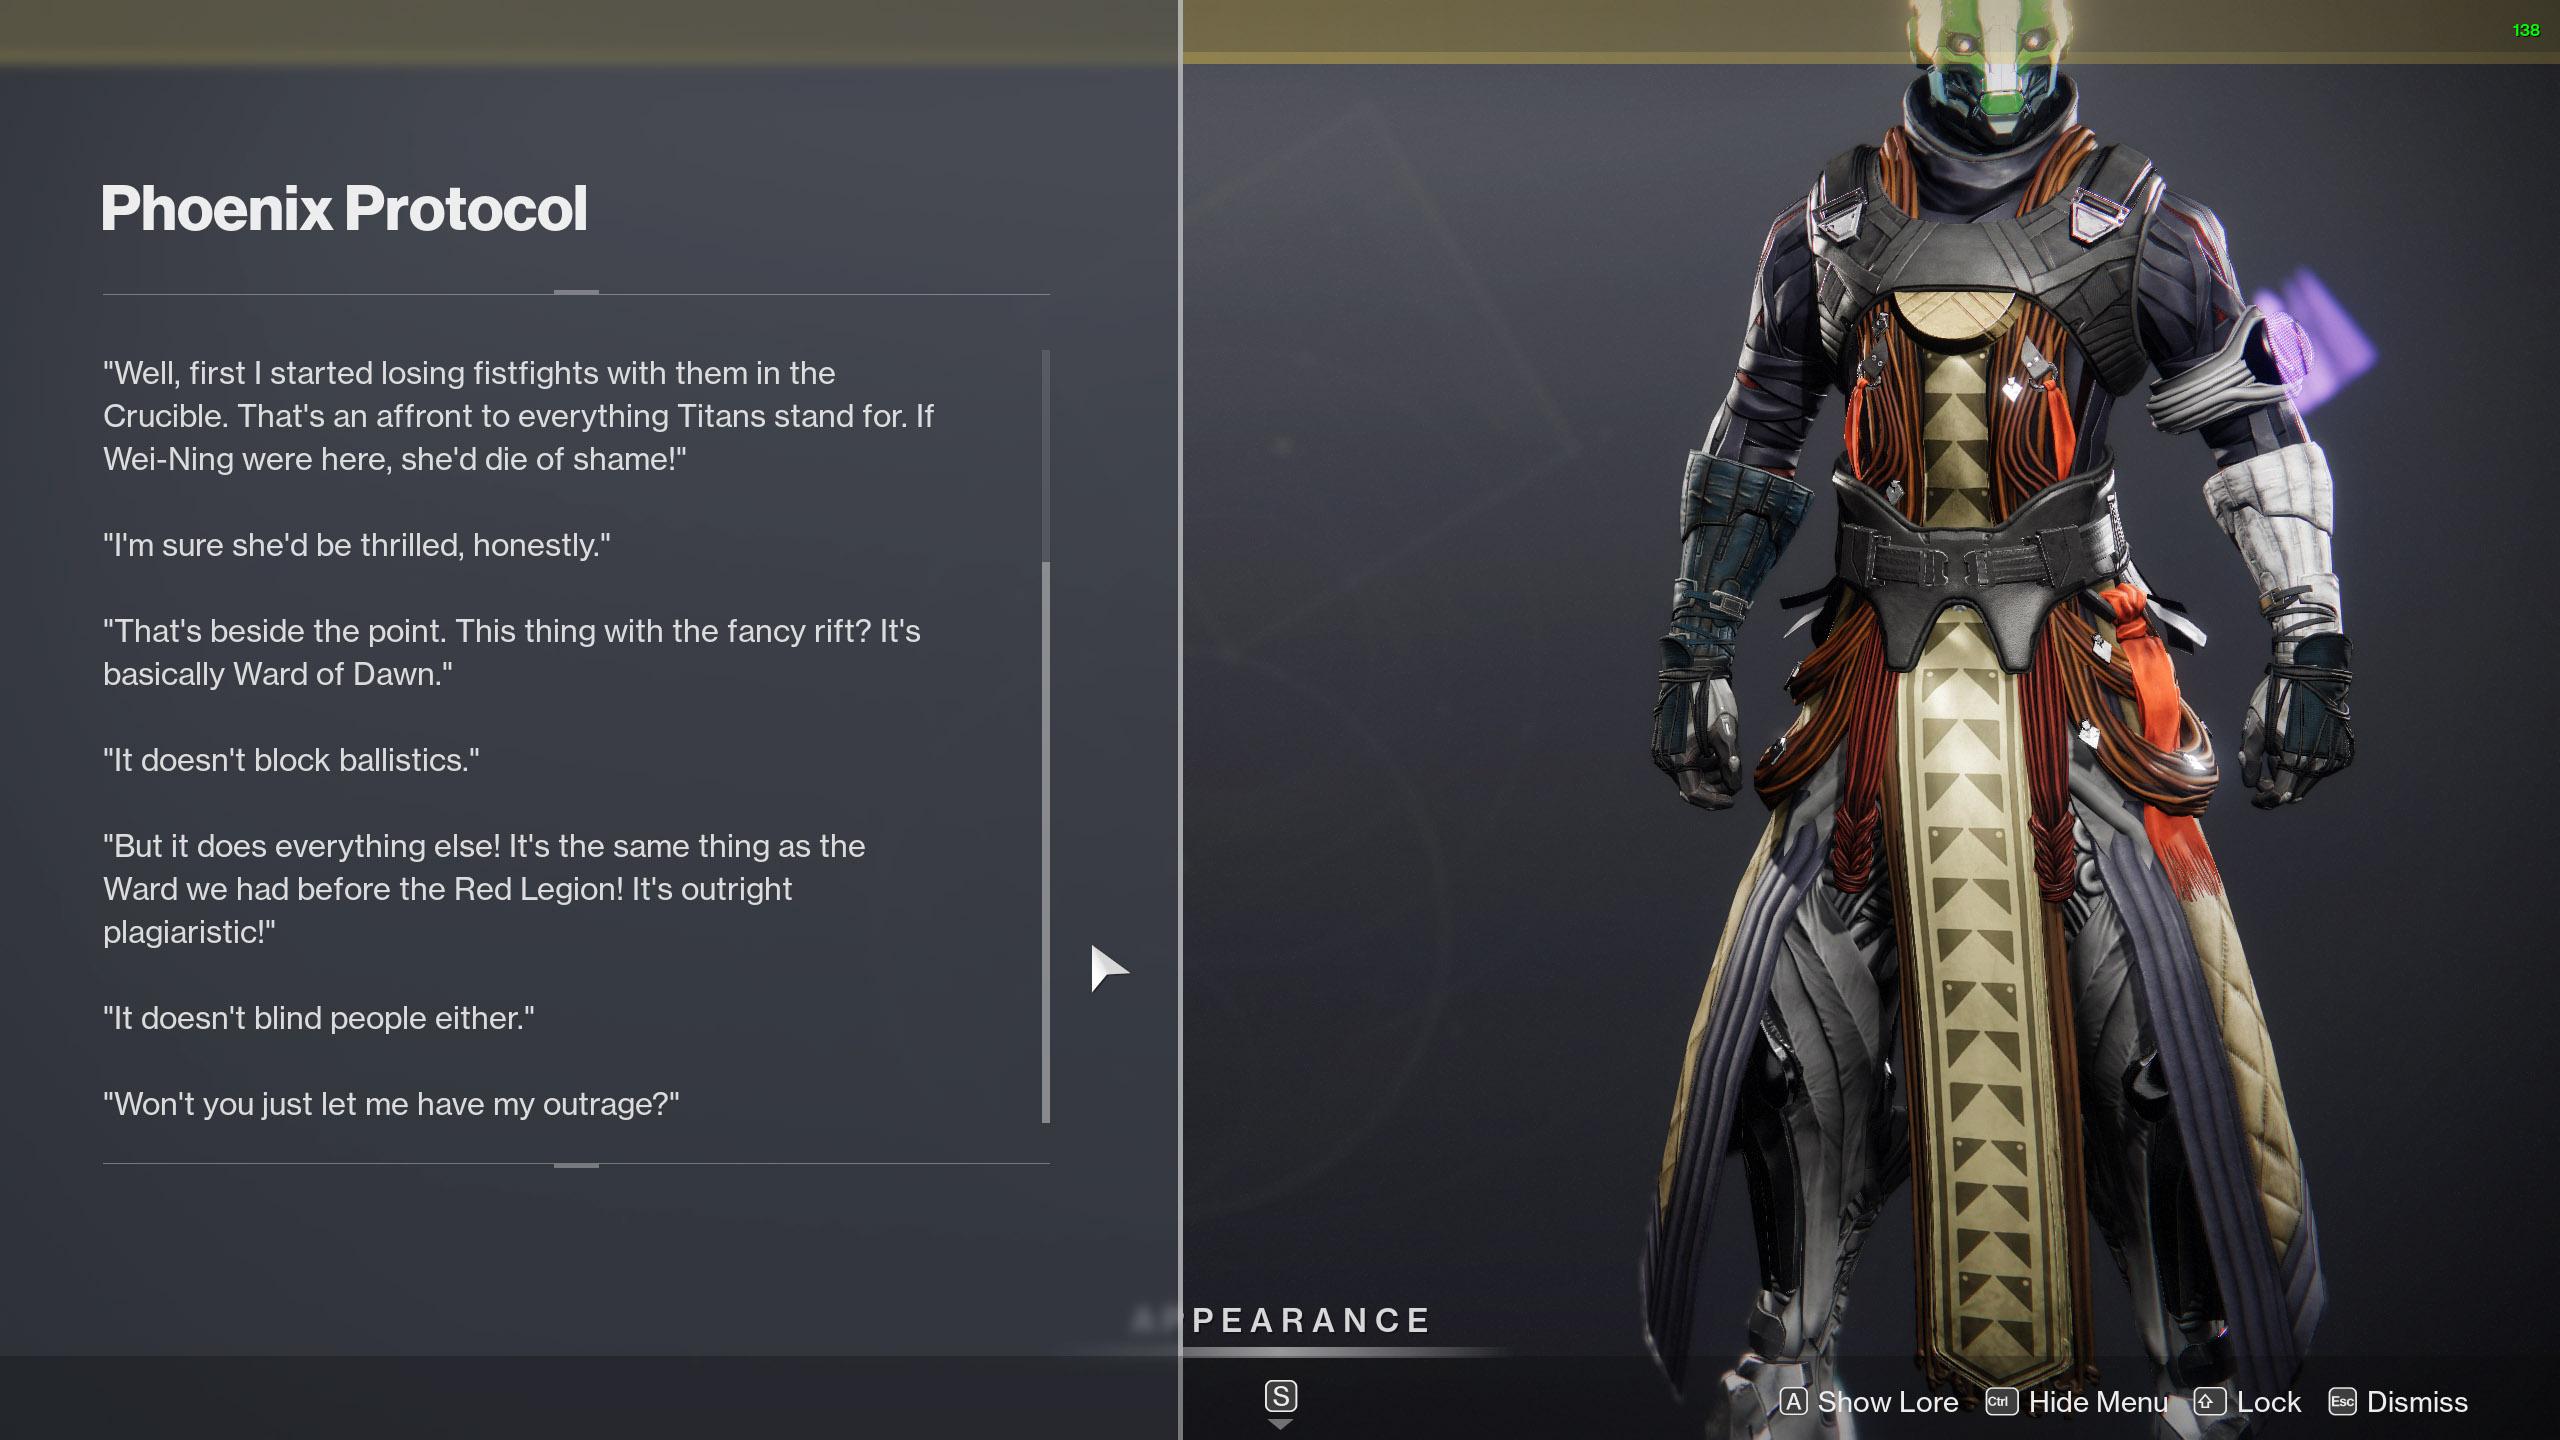 destiny 2 phoenix protocol lore